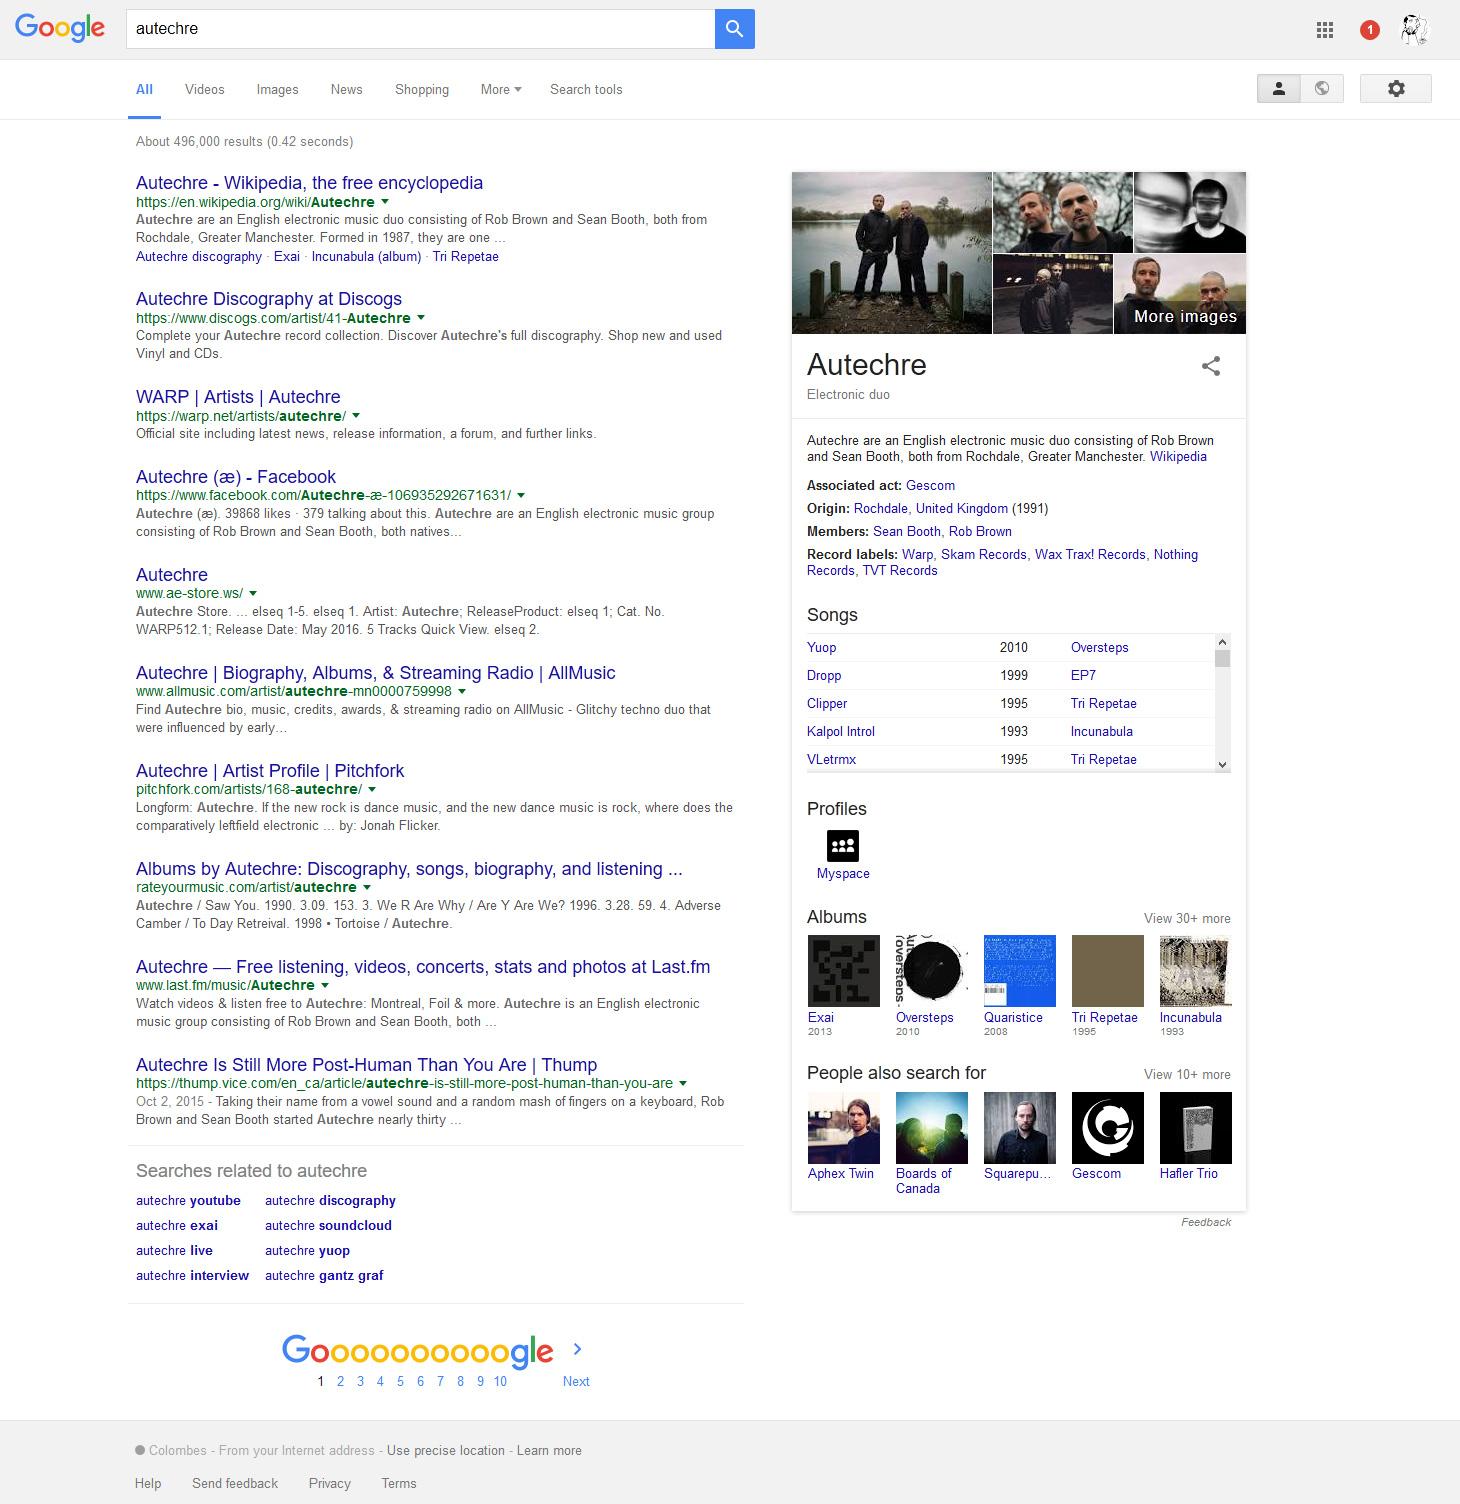 Google (Autechre)